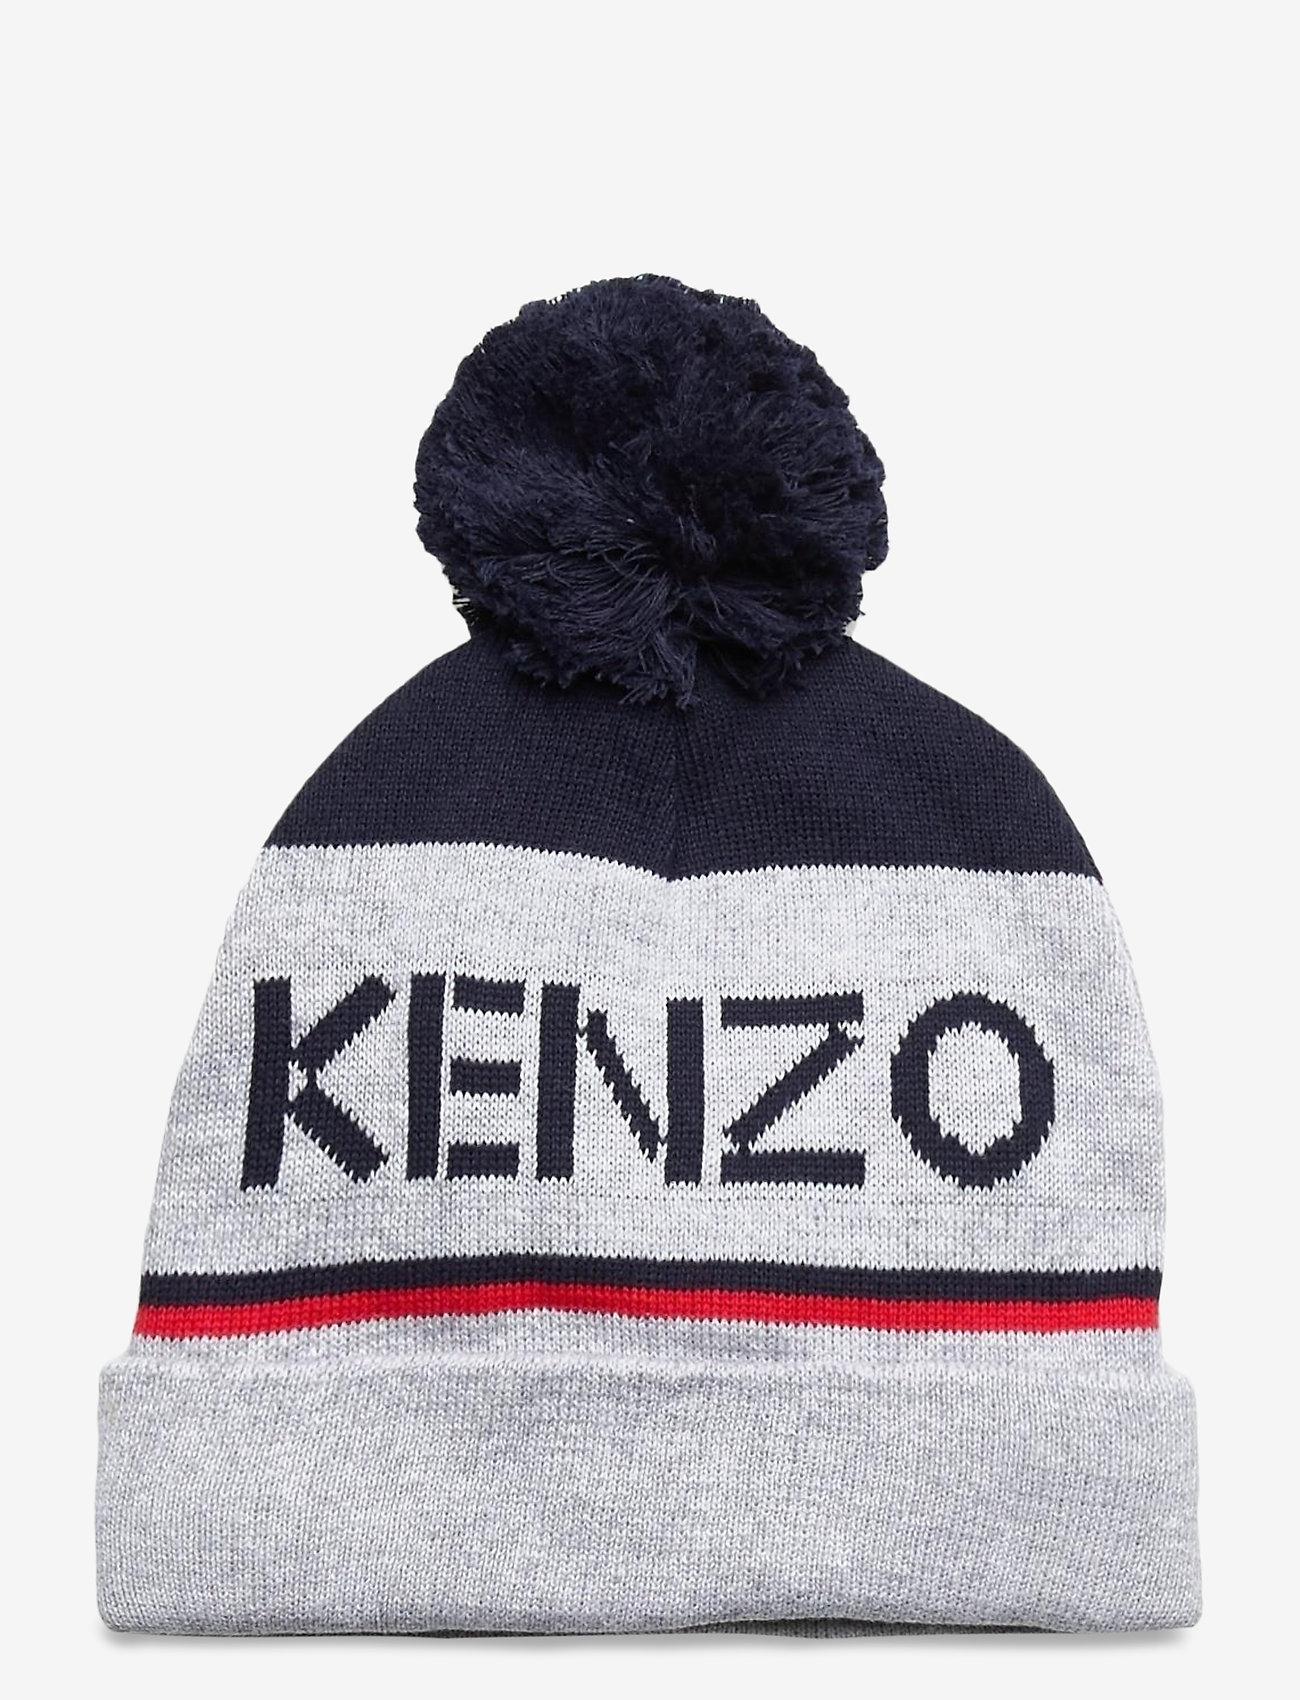 Kenzo - PULL ON HAT - huer - grey marl - 0